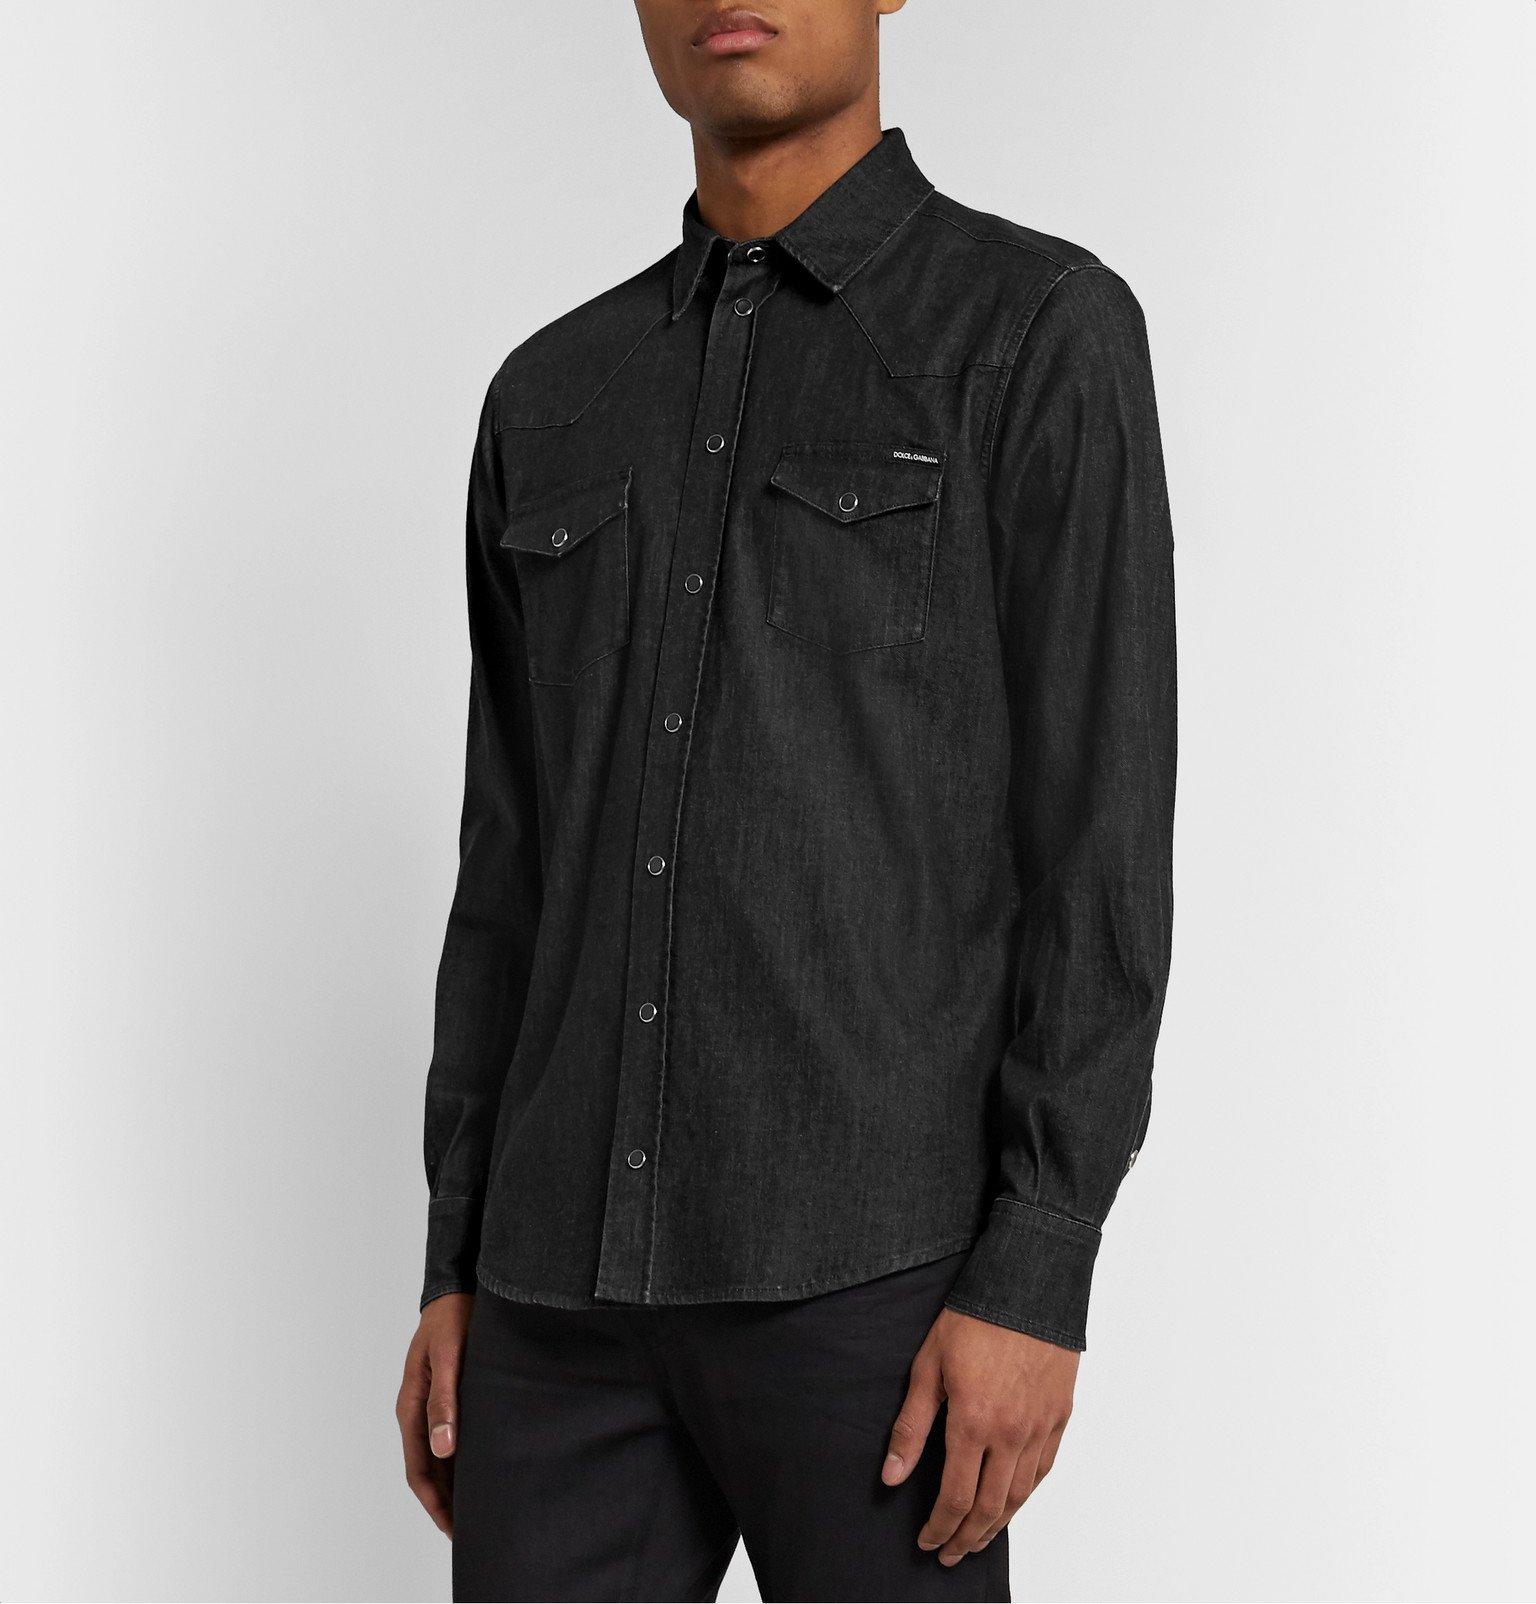 Dolce & Gabbana - Slim-Fit Denim Western Shirt - Black